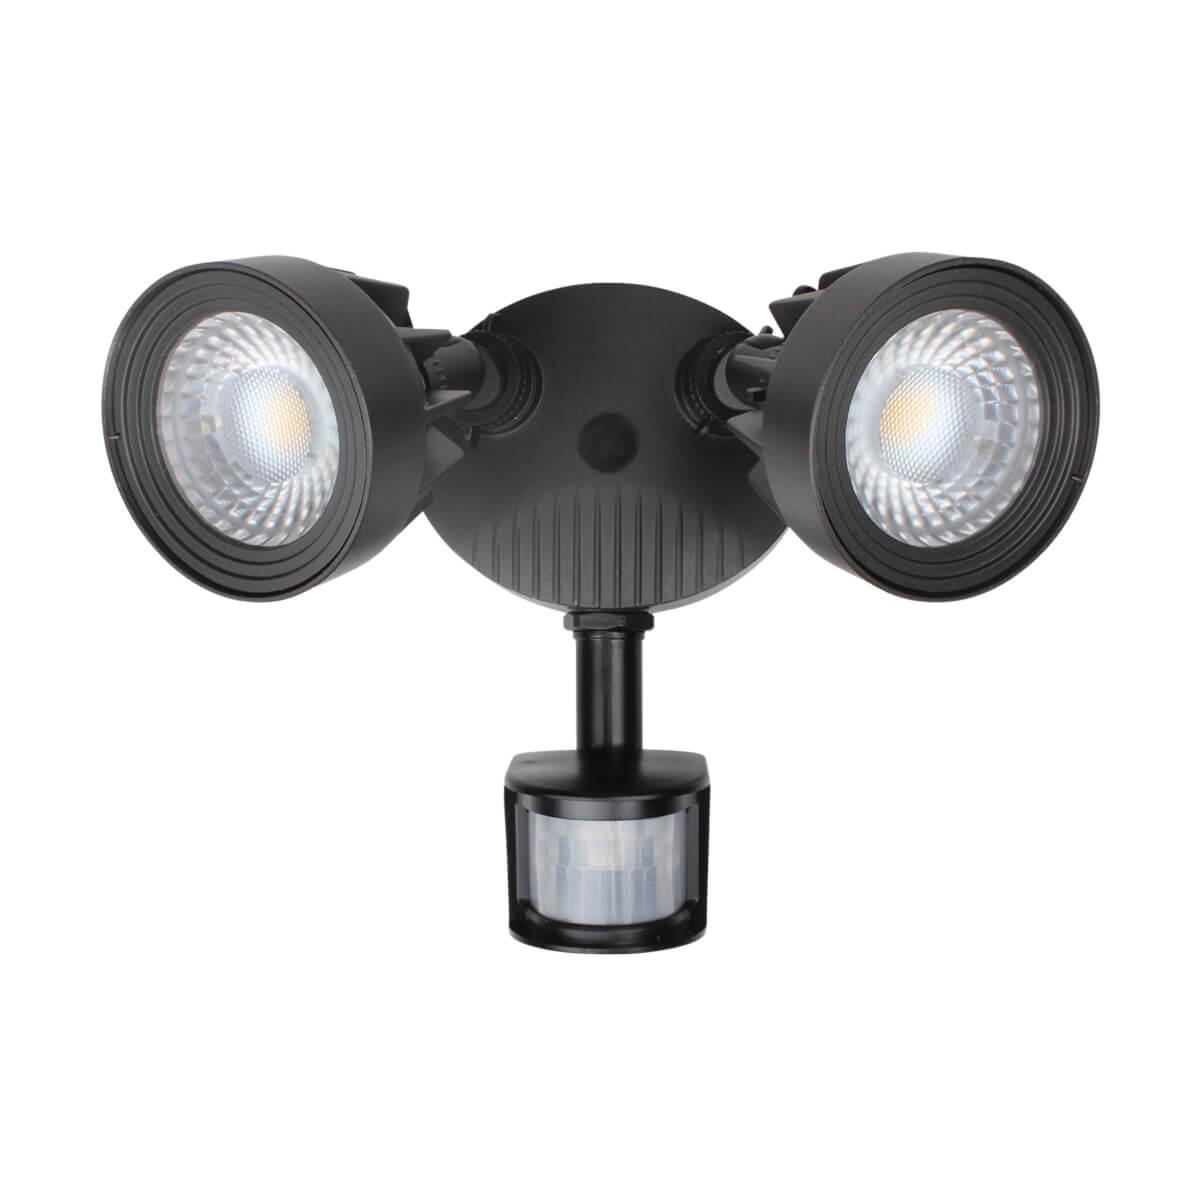 Luminus LED 24W 2-Head Security Light